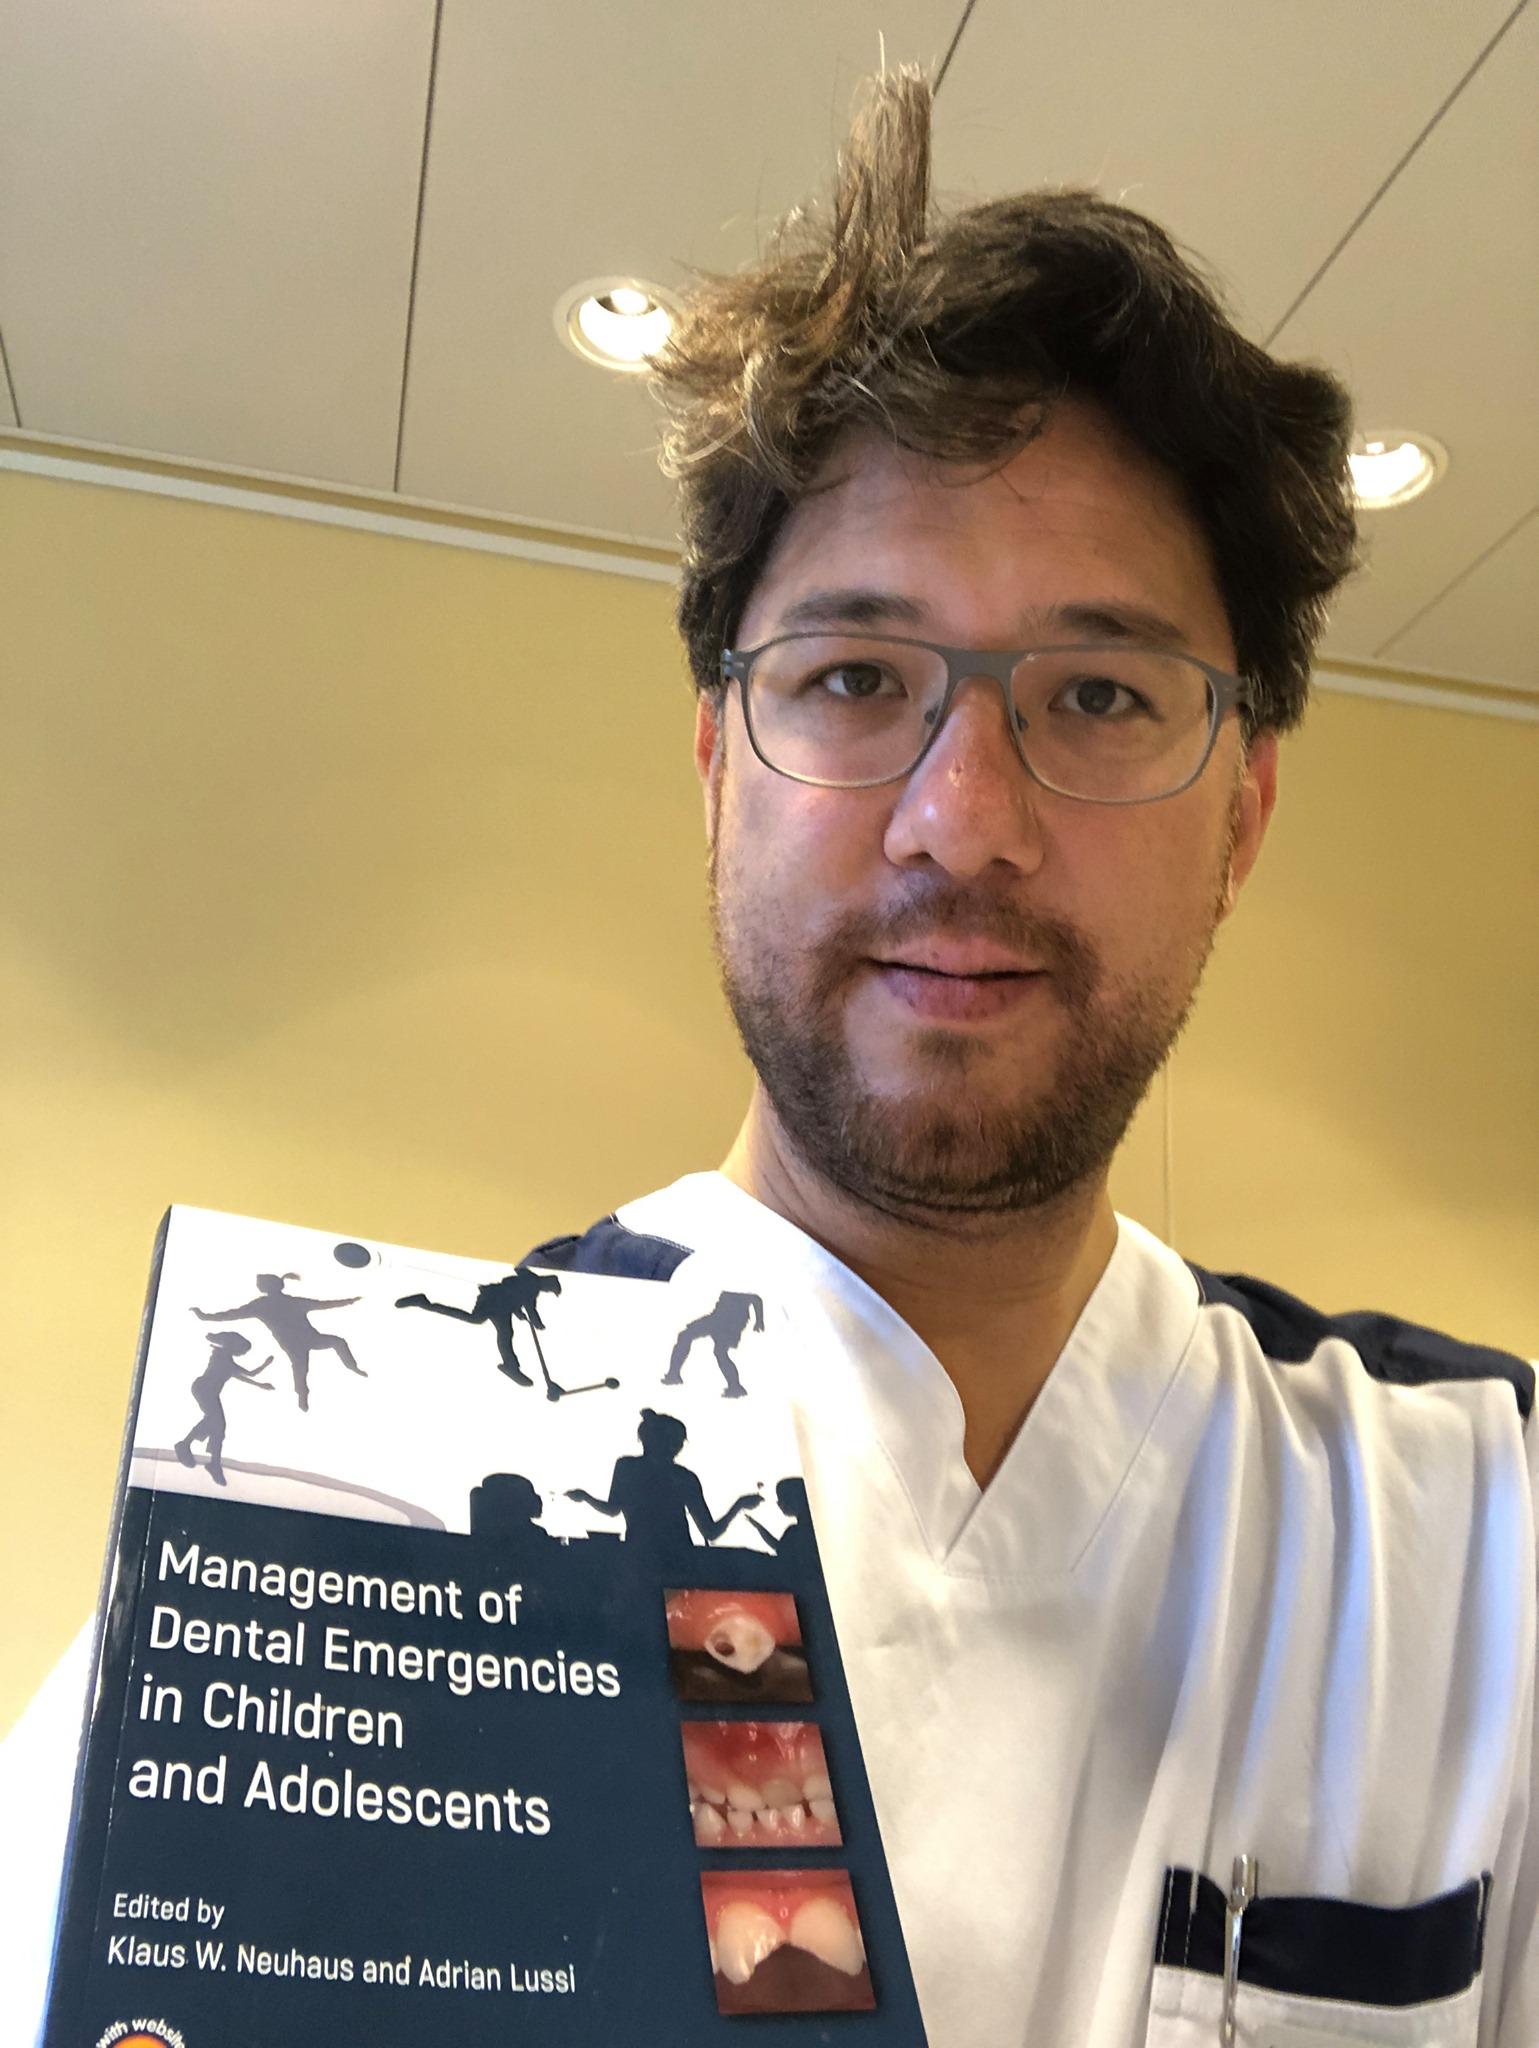 Buch über Notfallzahnmedizin bei Kindern